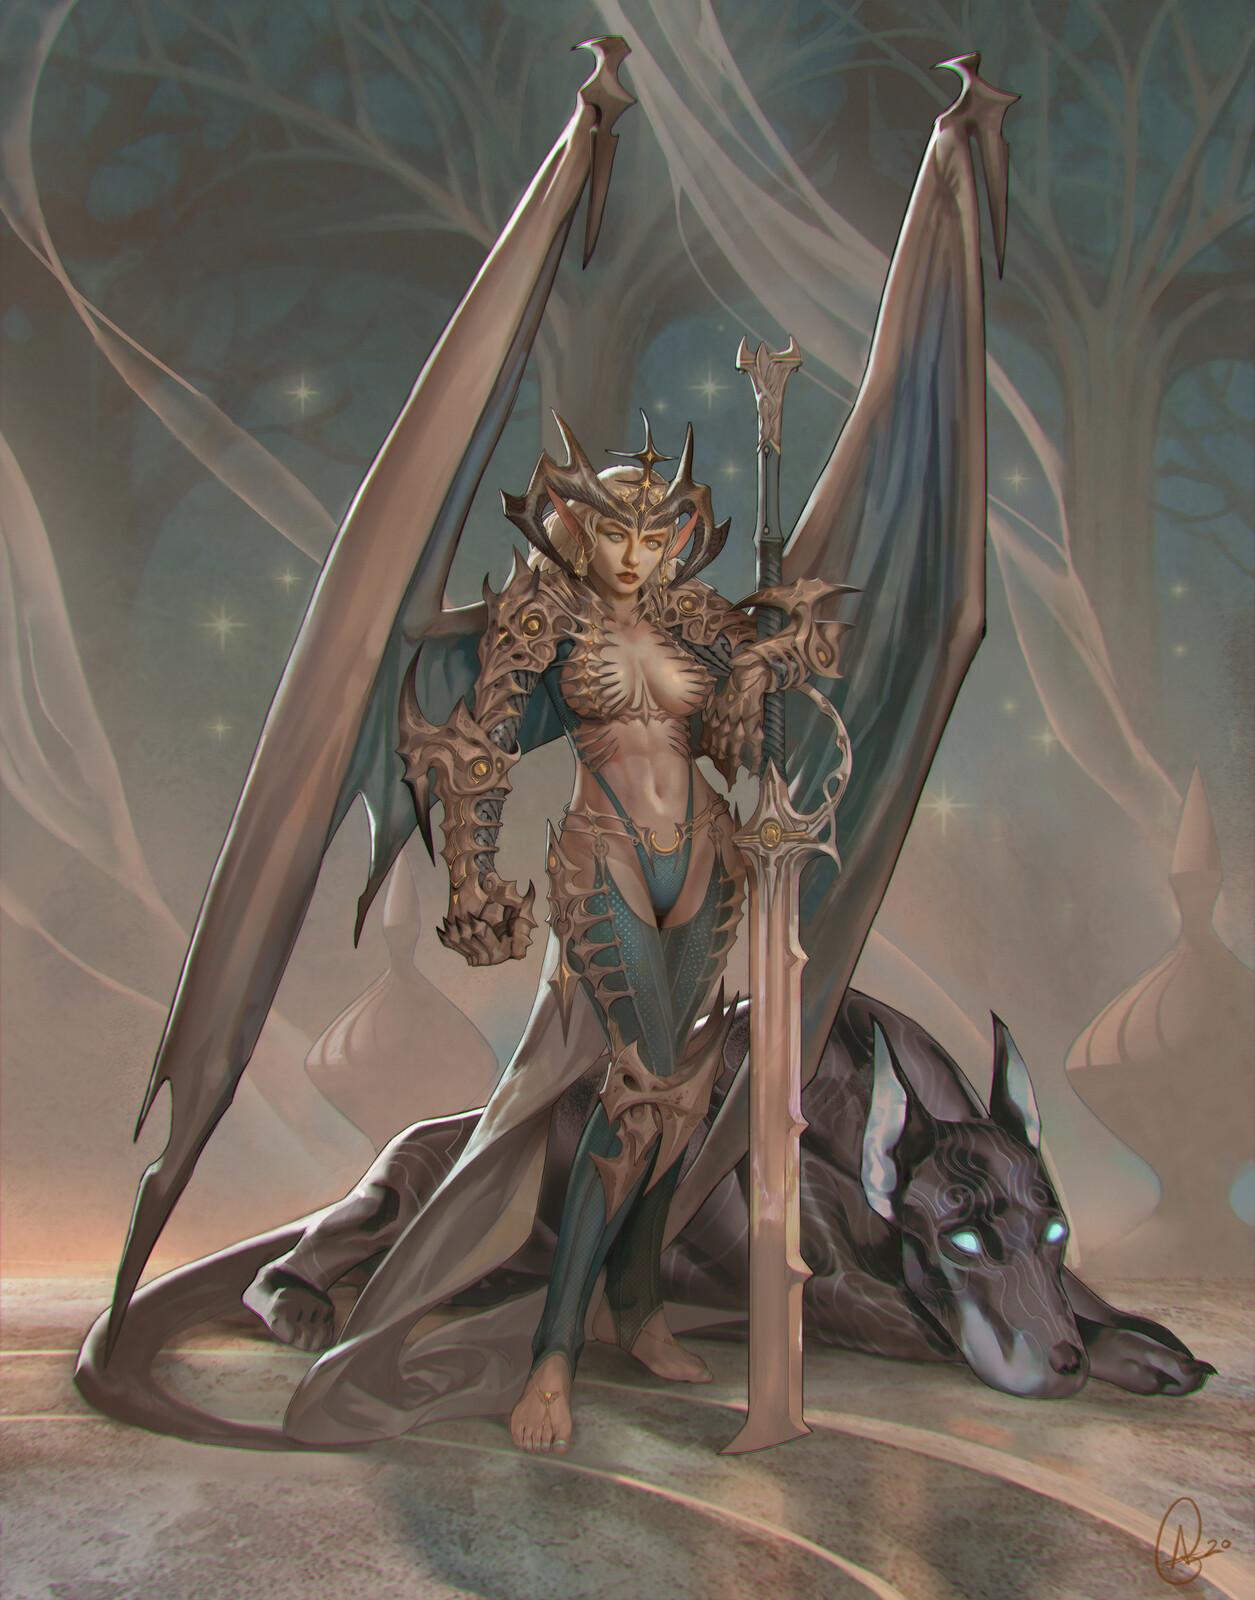 Ikthea Dragonkin - Personal work